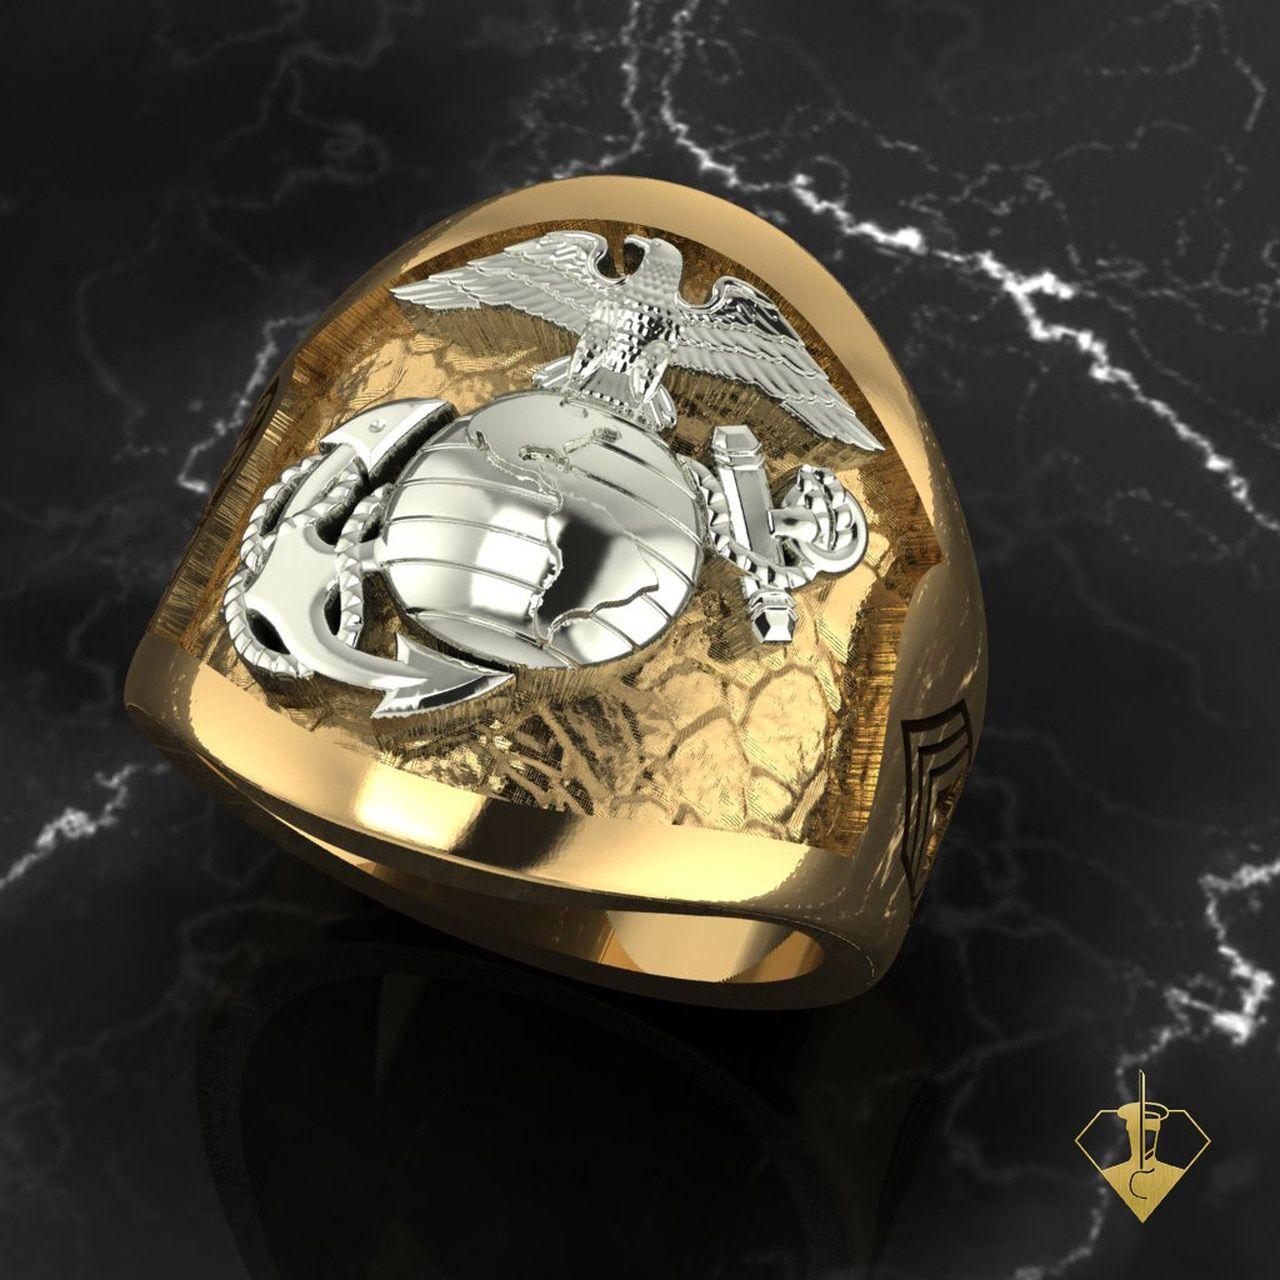 USMC MARINE SPIRIT DE CORPS TWO TONE 10K GOLD RING in 2020